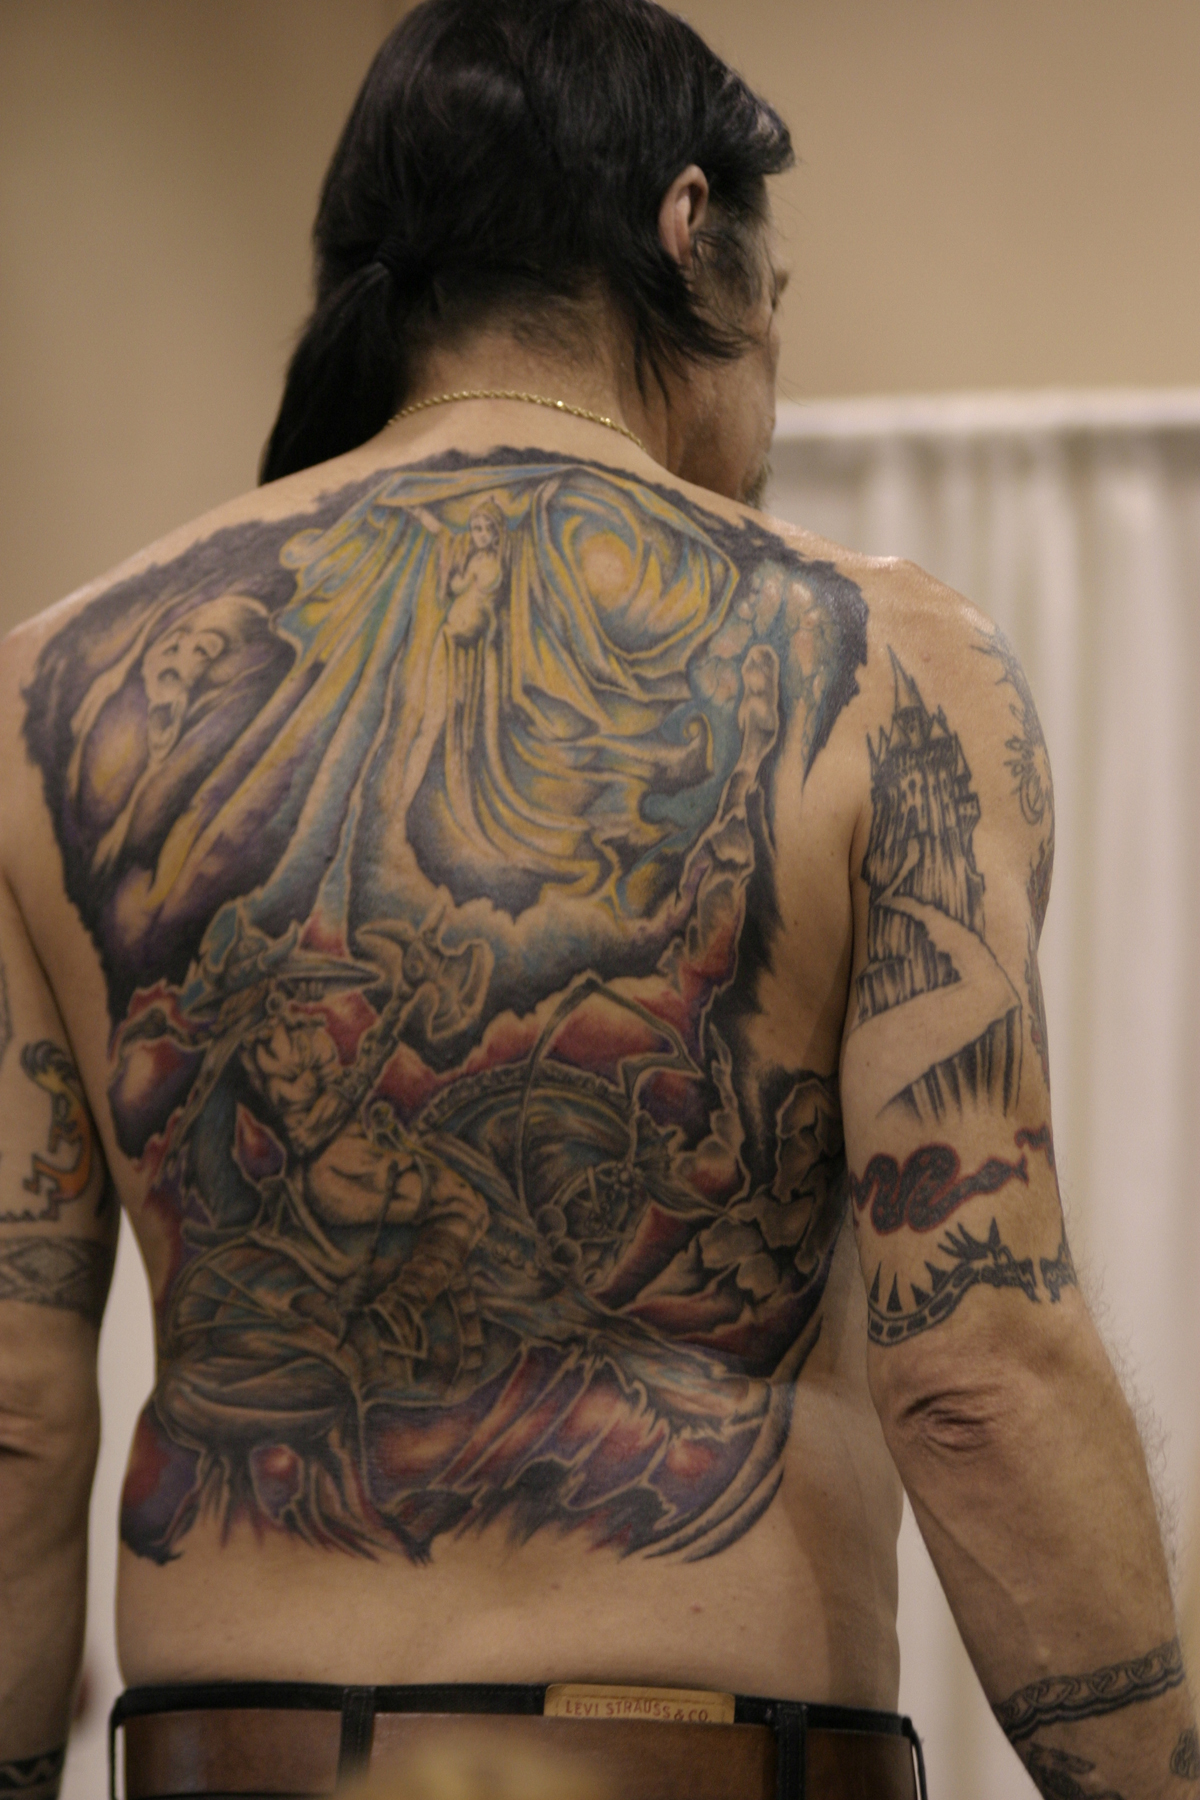 Tattoo_Expo031.JPG